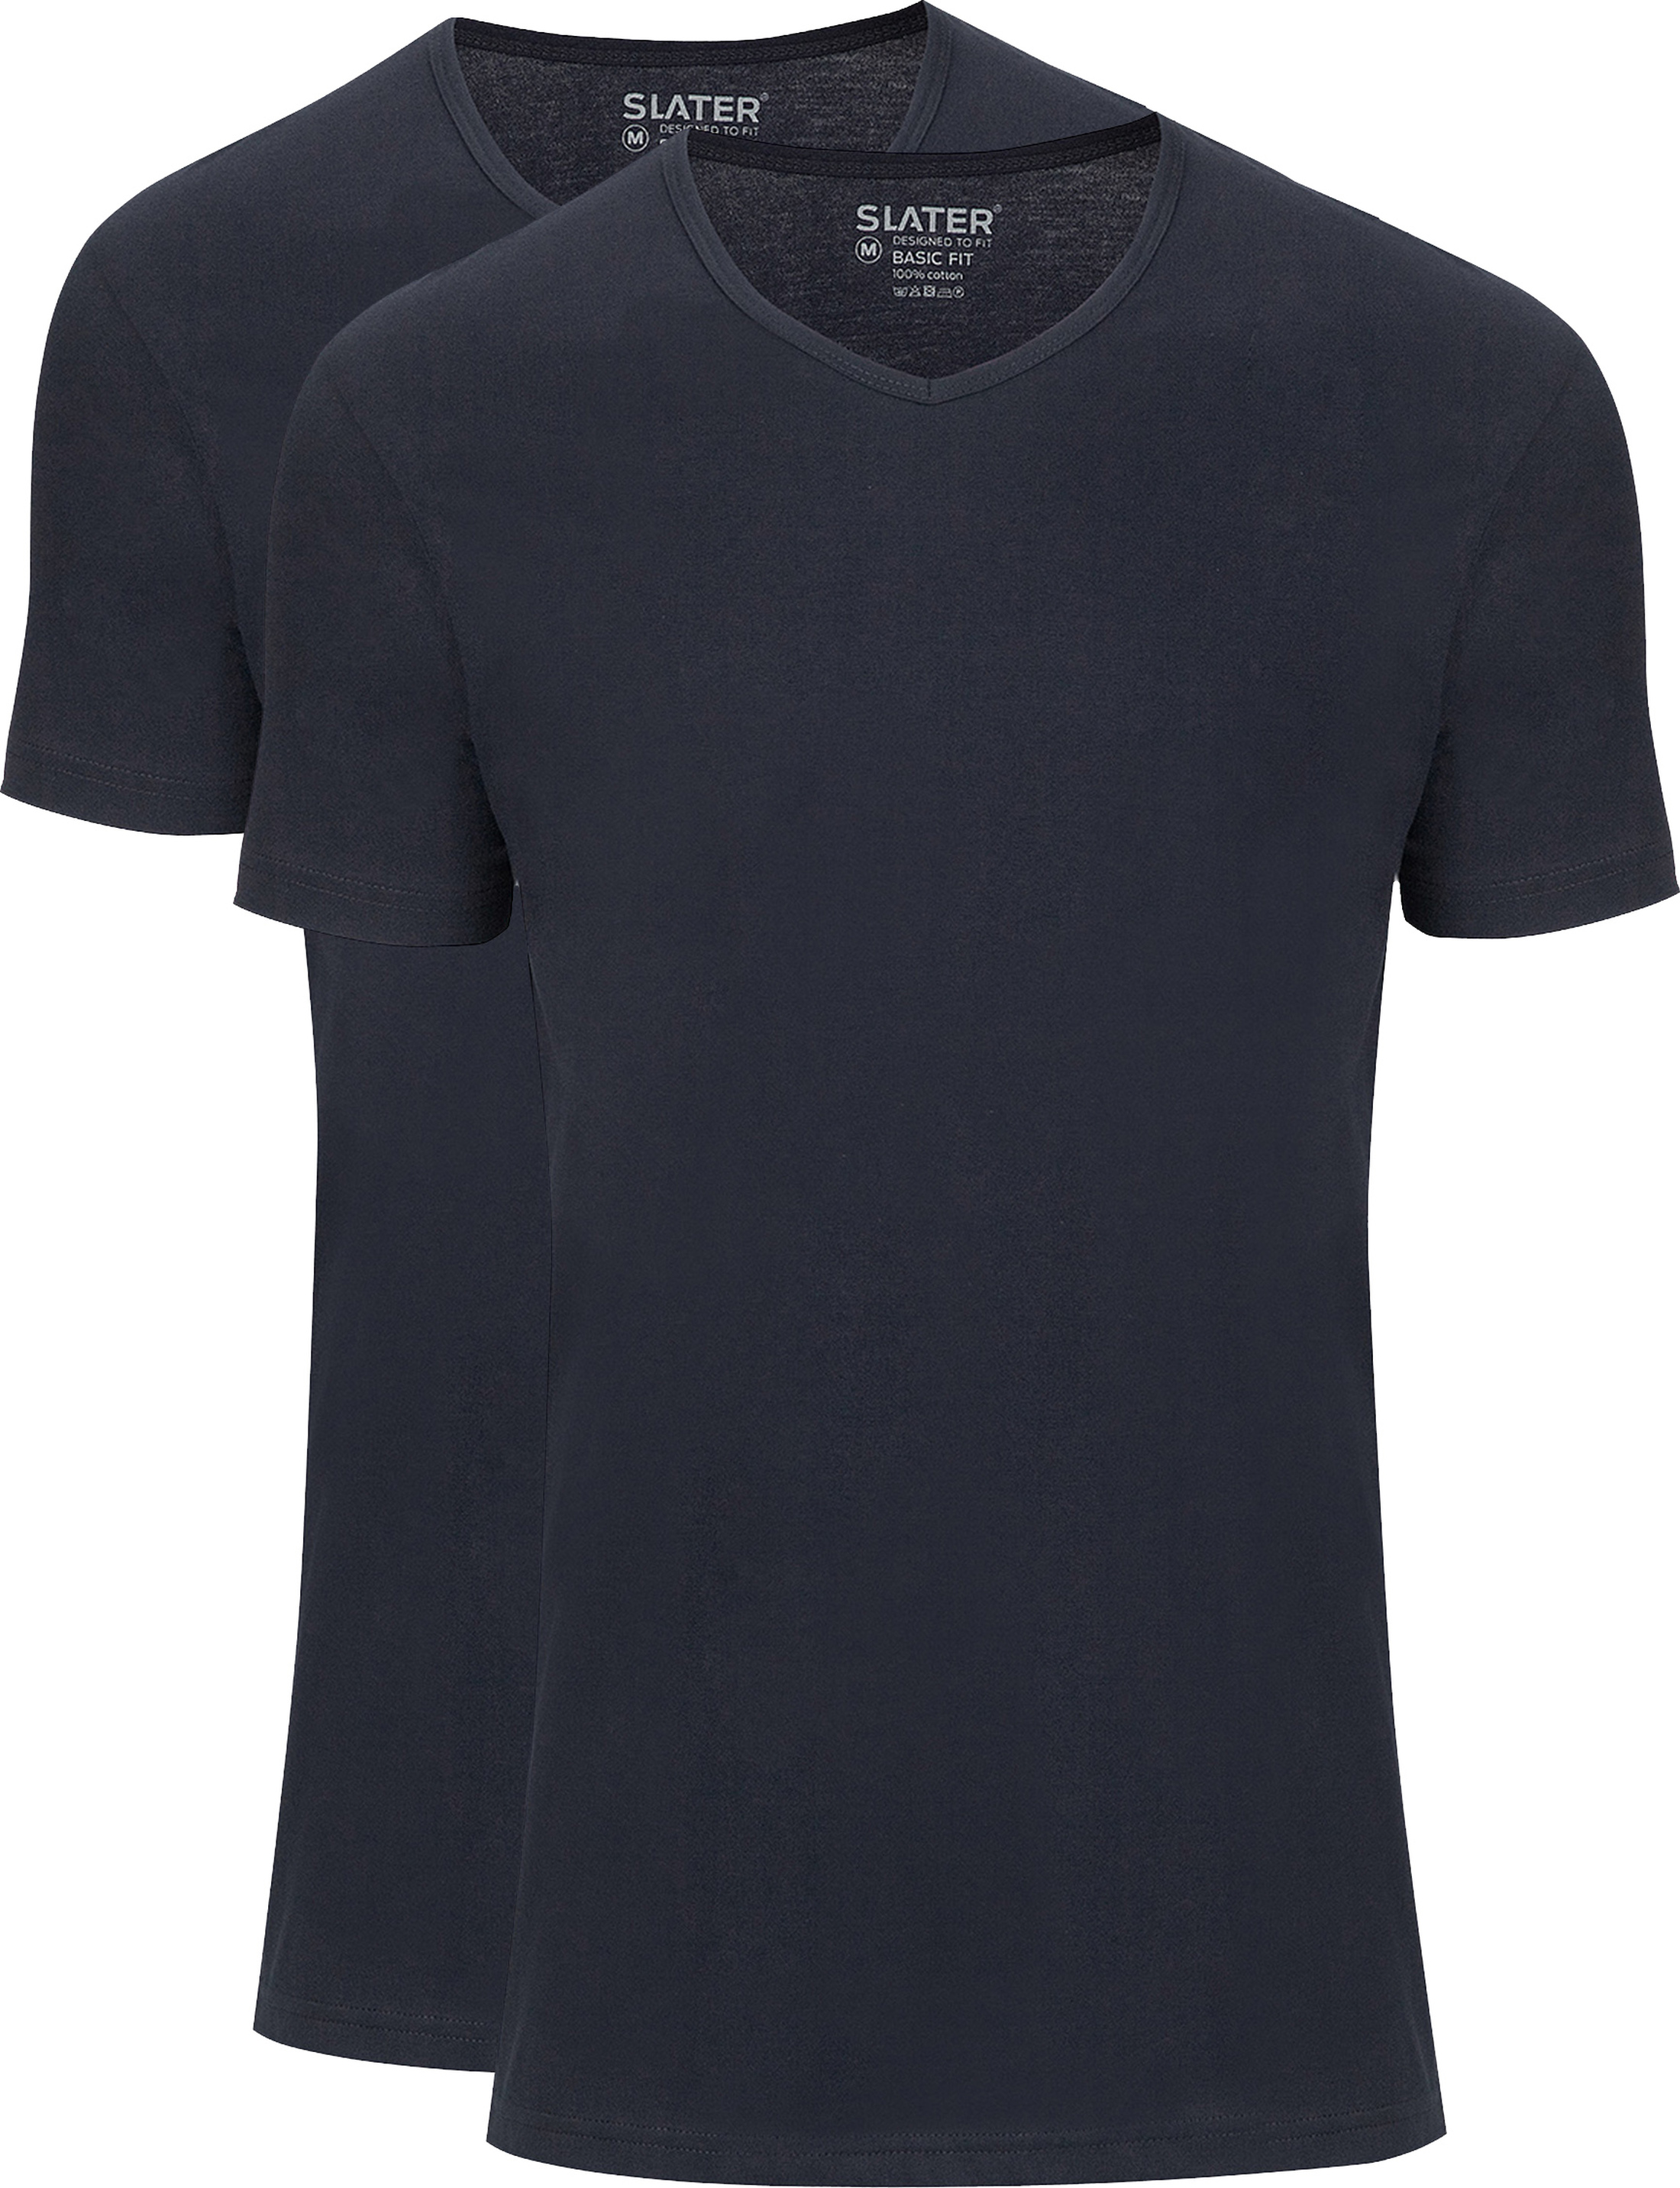 Slater 2-pack Basic Fit T-shirt V-neck Navy foto 0